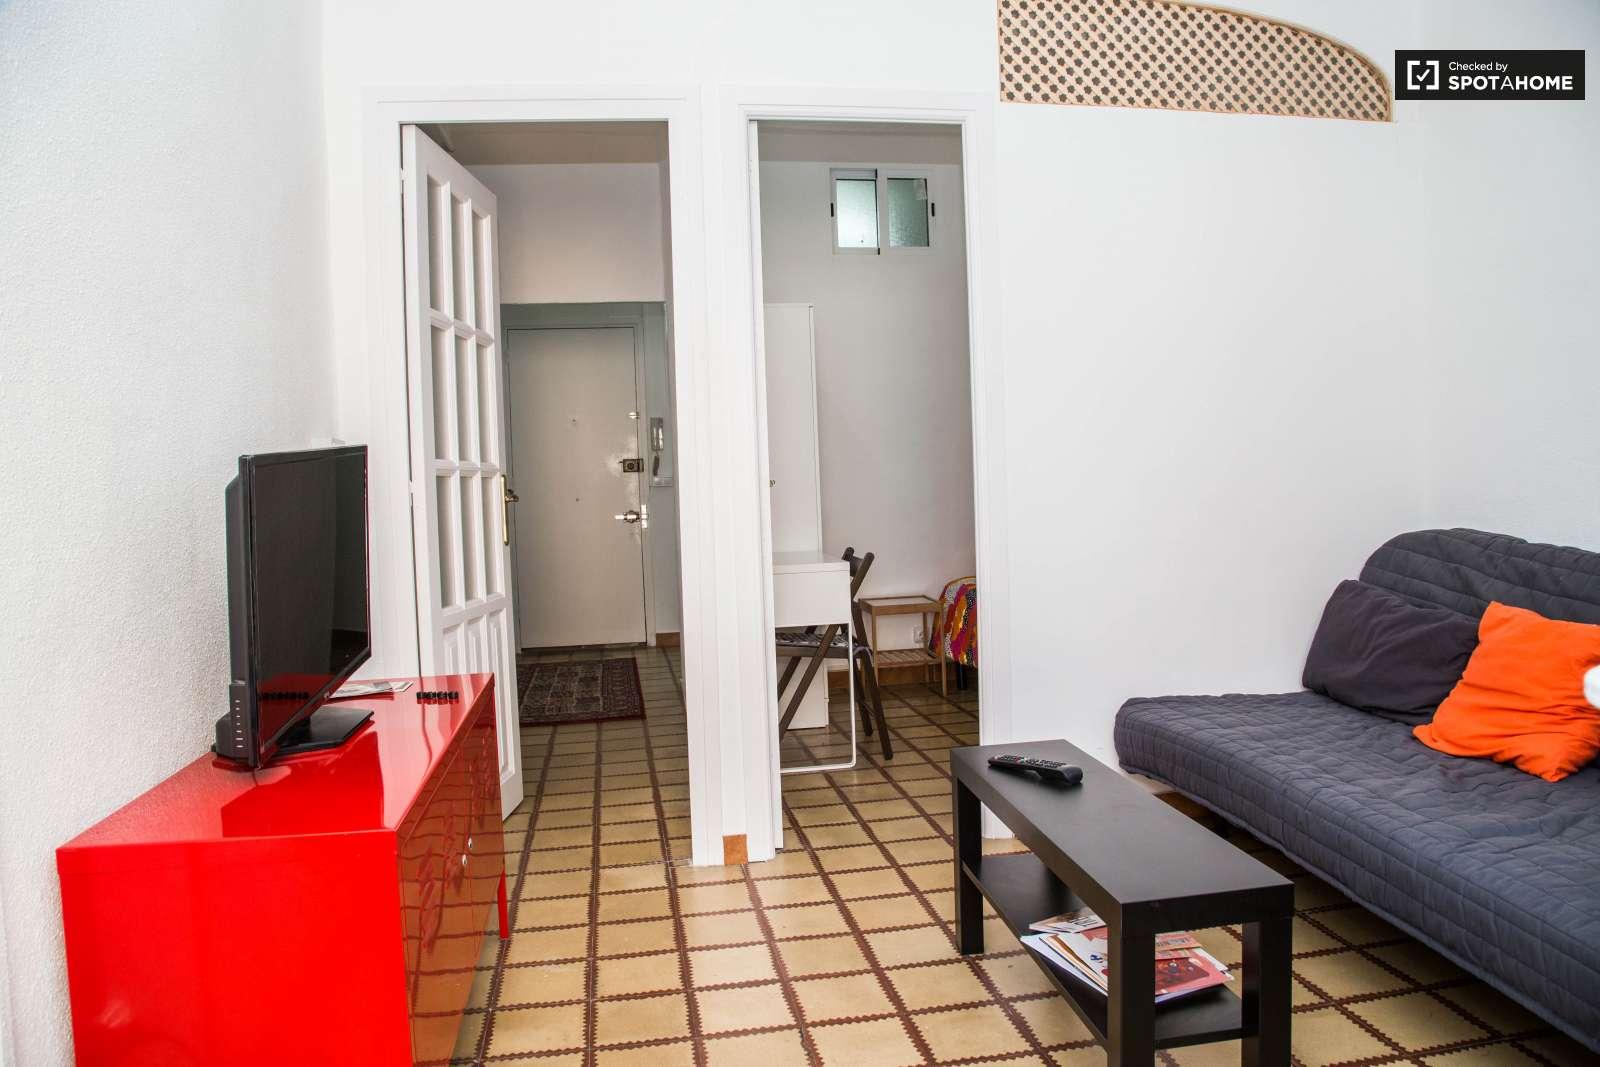 rooms for rent in 4 bedroom apartment in el raval barcelona